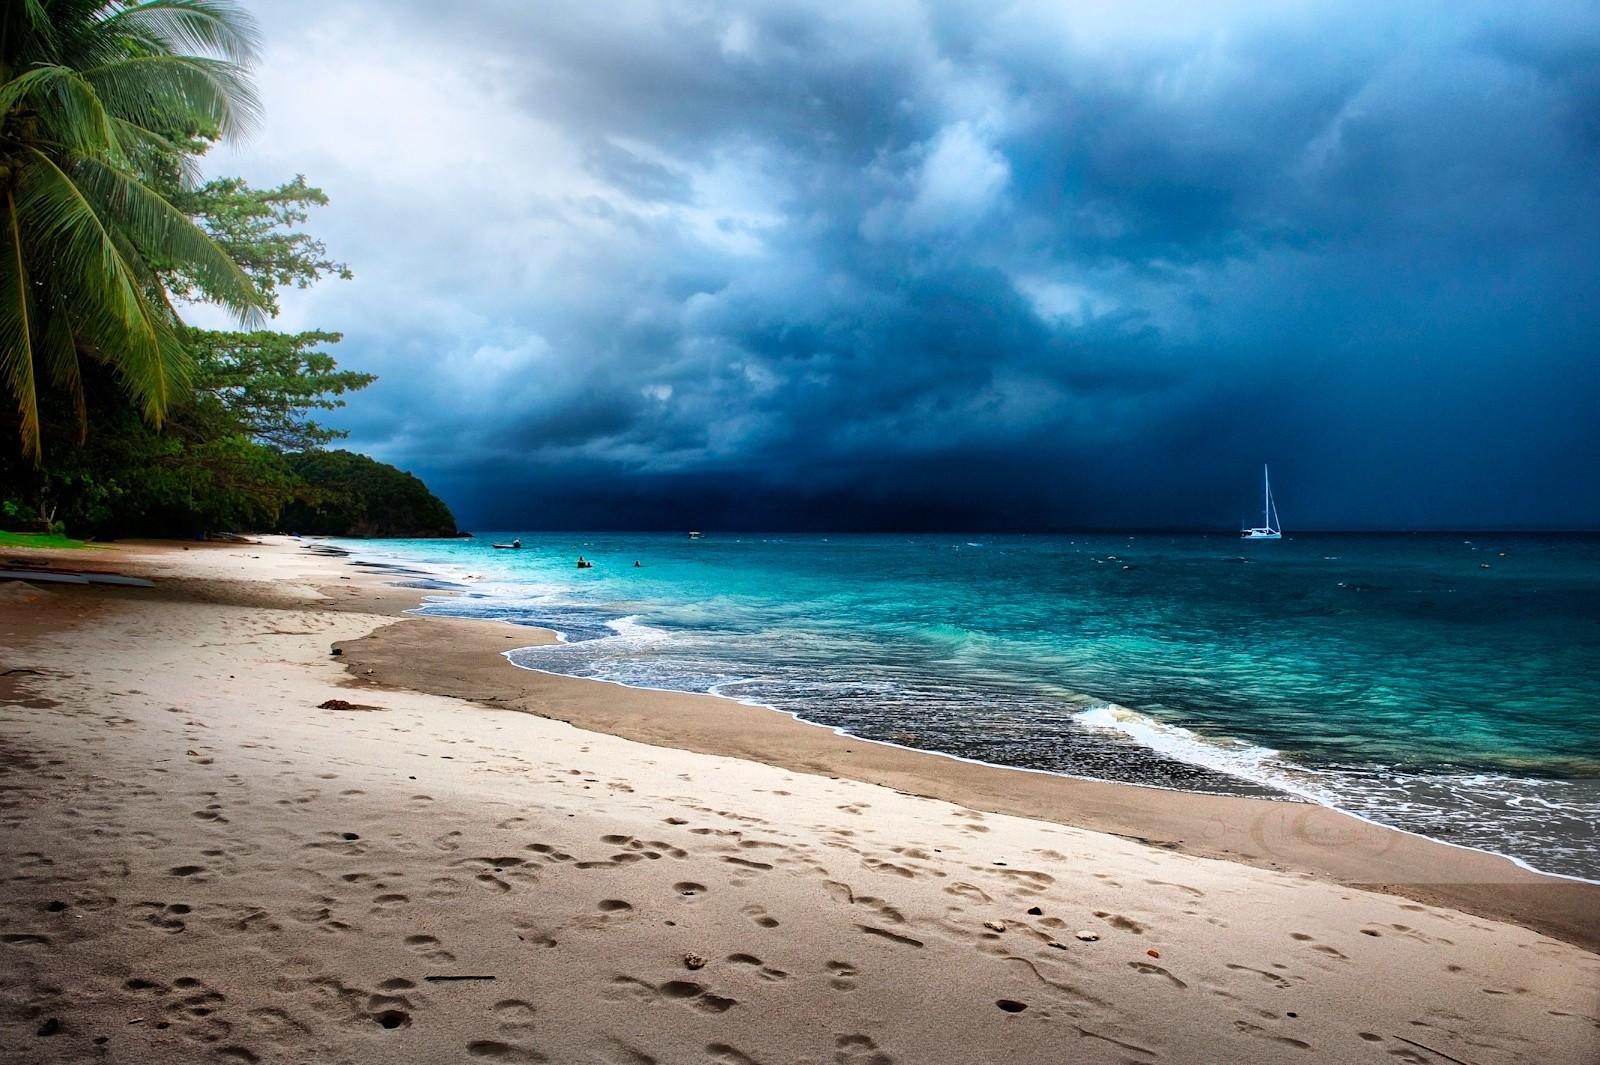 Beach Sand Clouds Sea Caribbean Water Peaceful